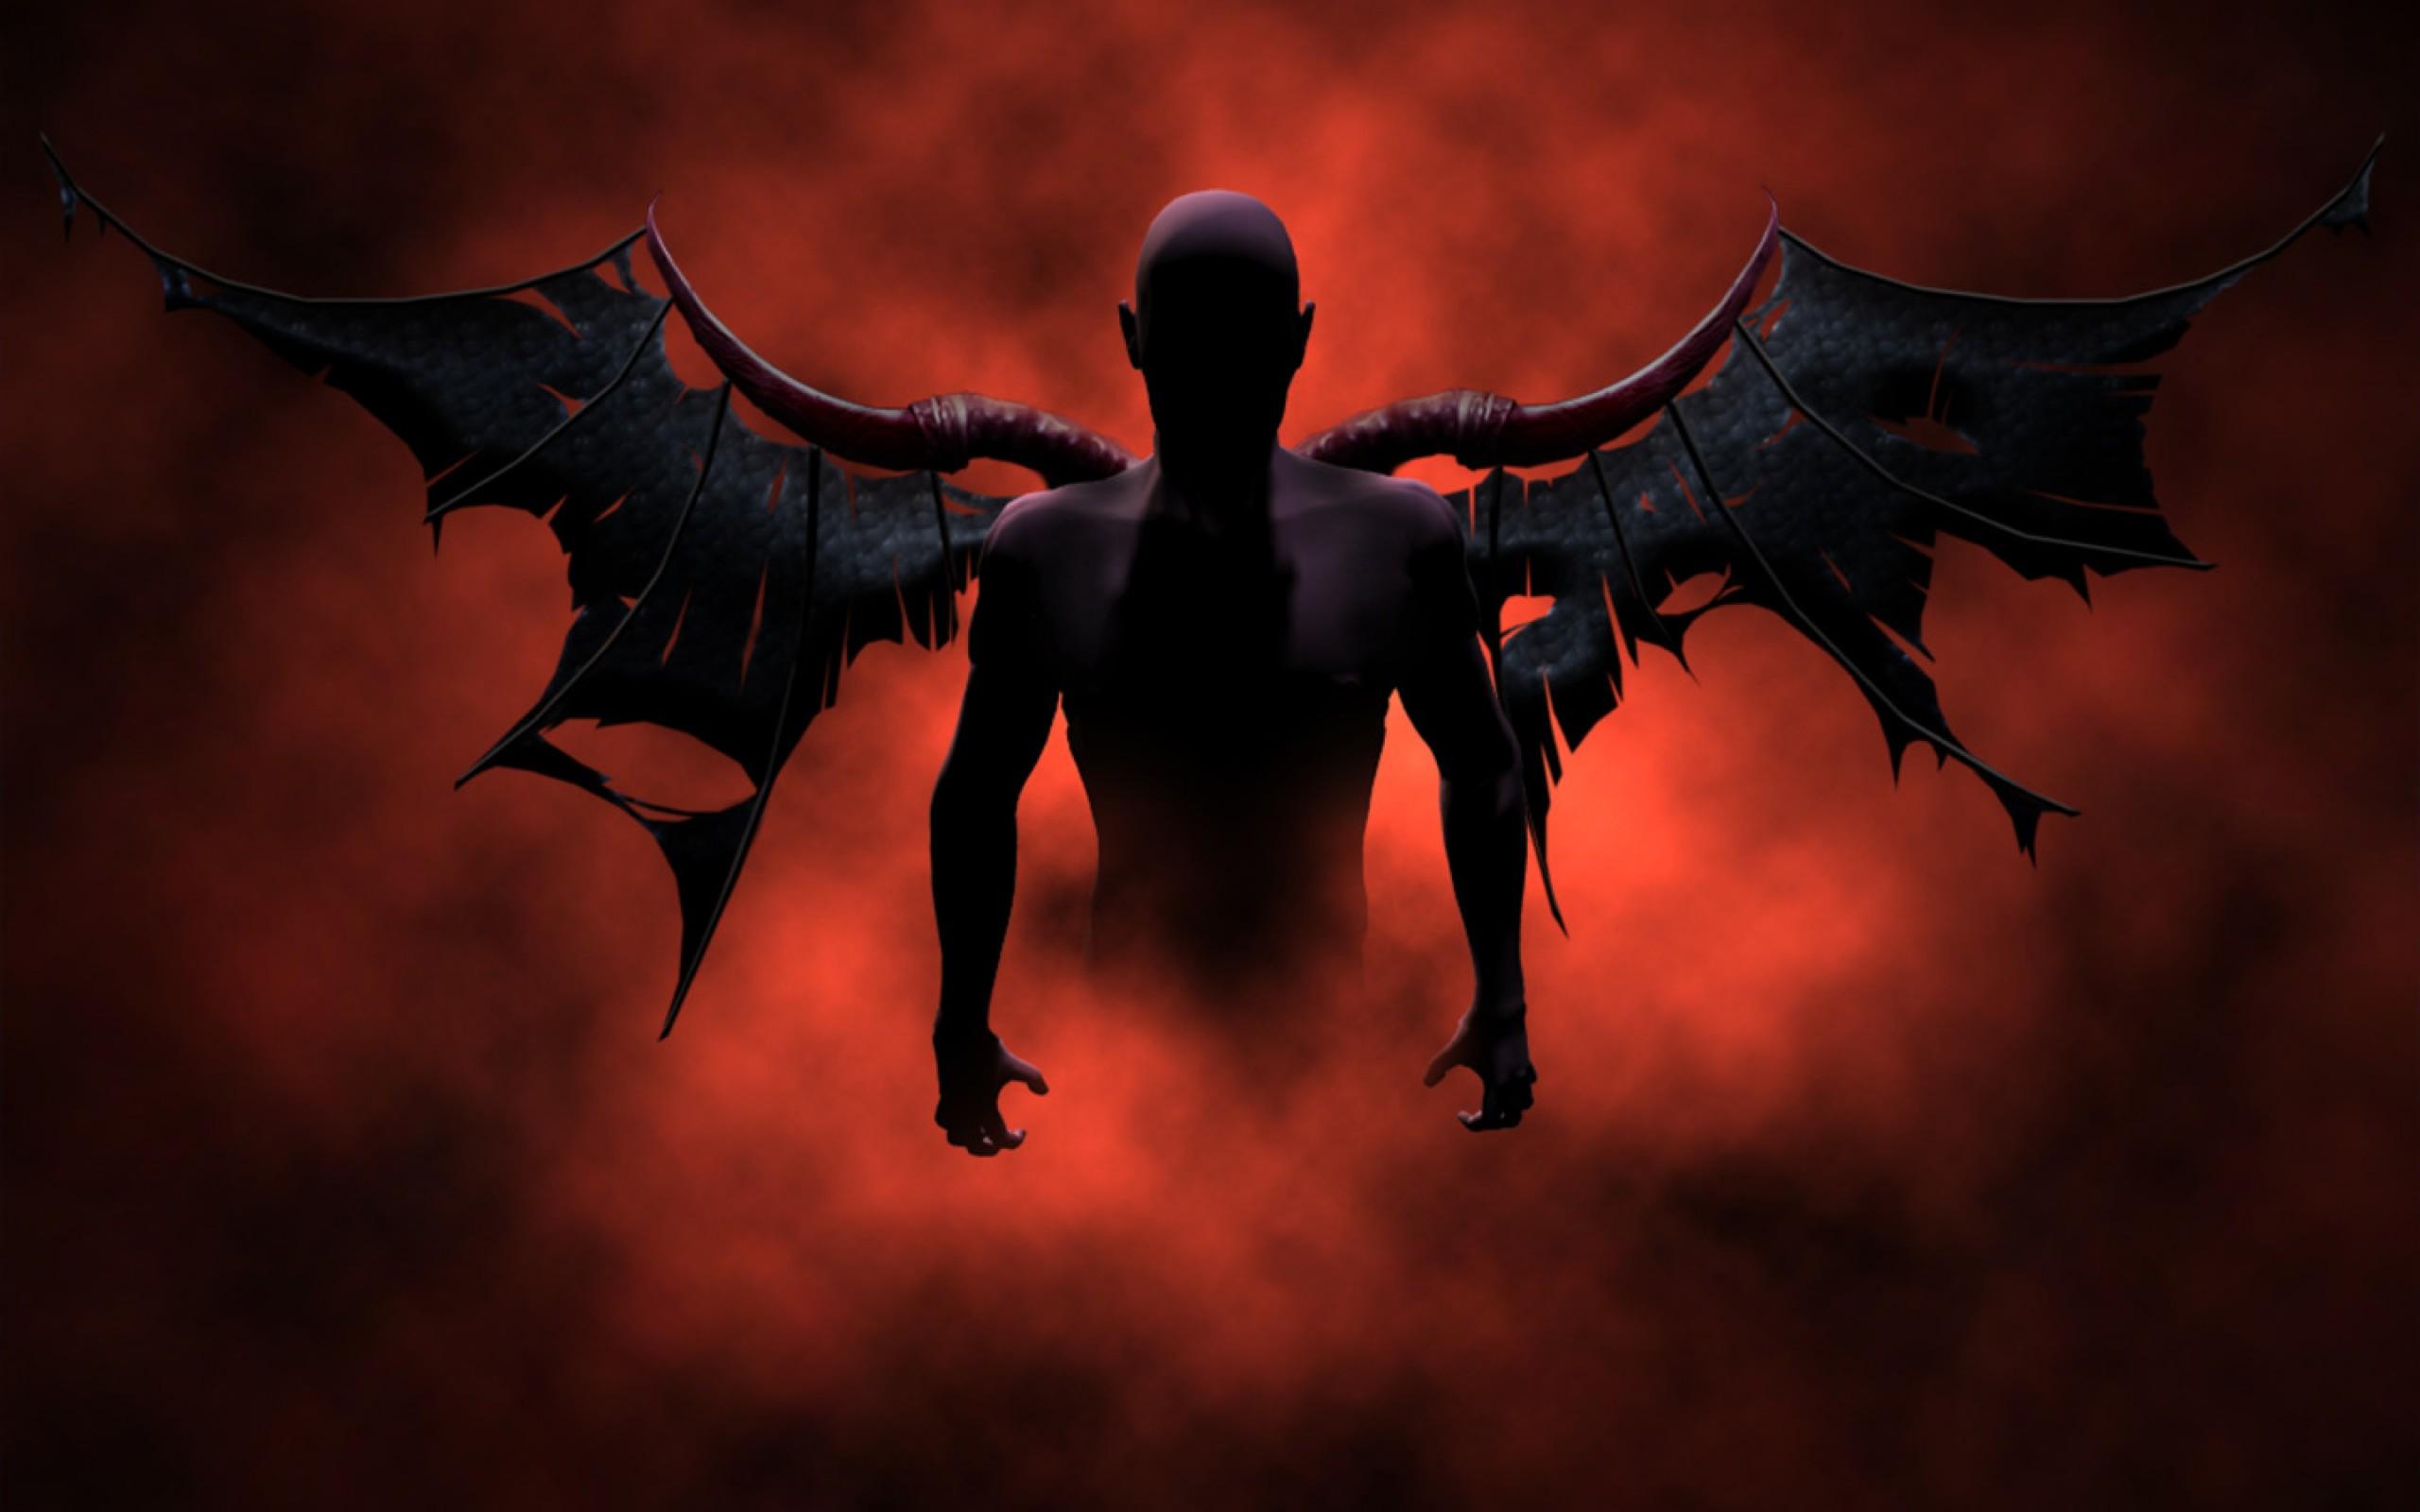 devil making sense of the bible